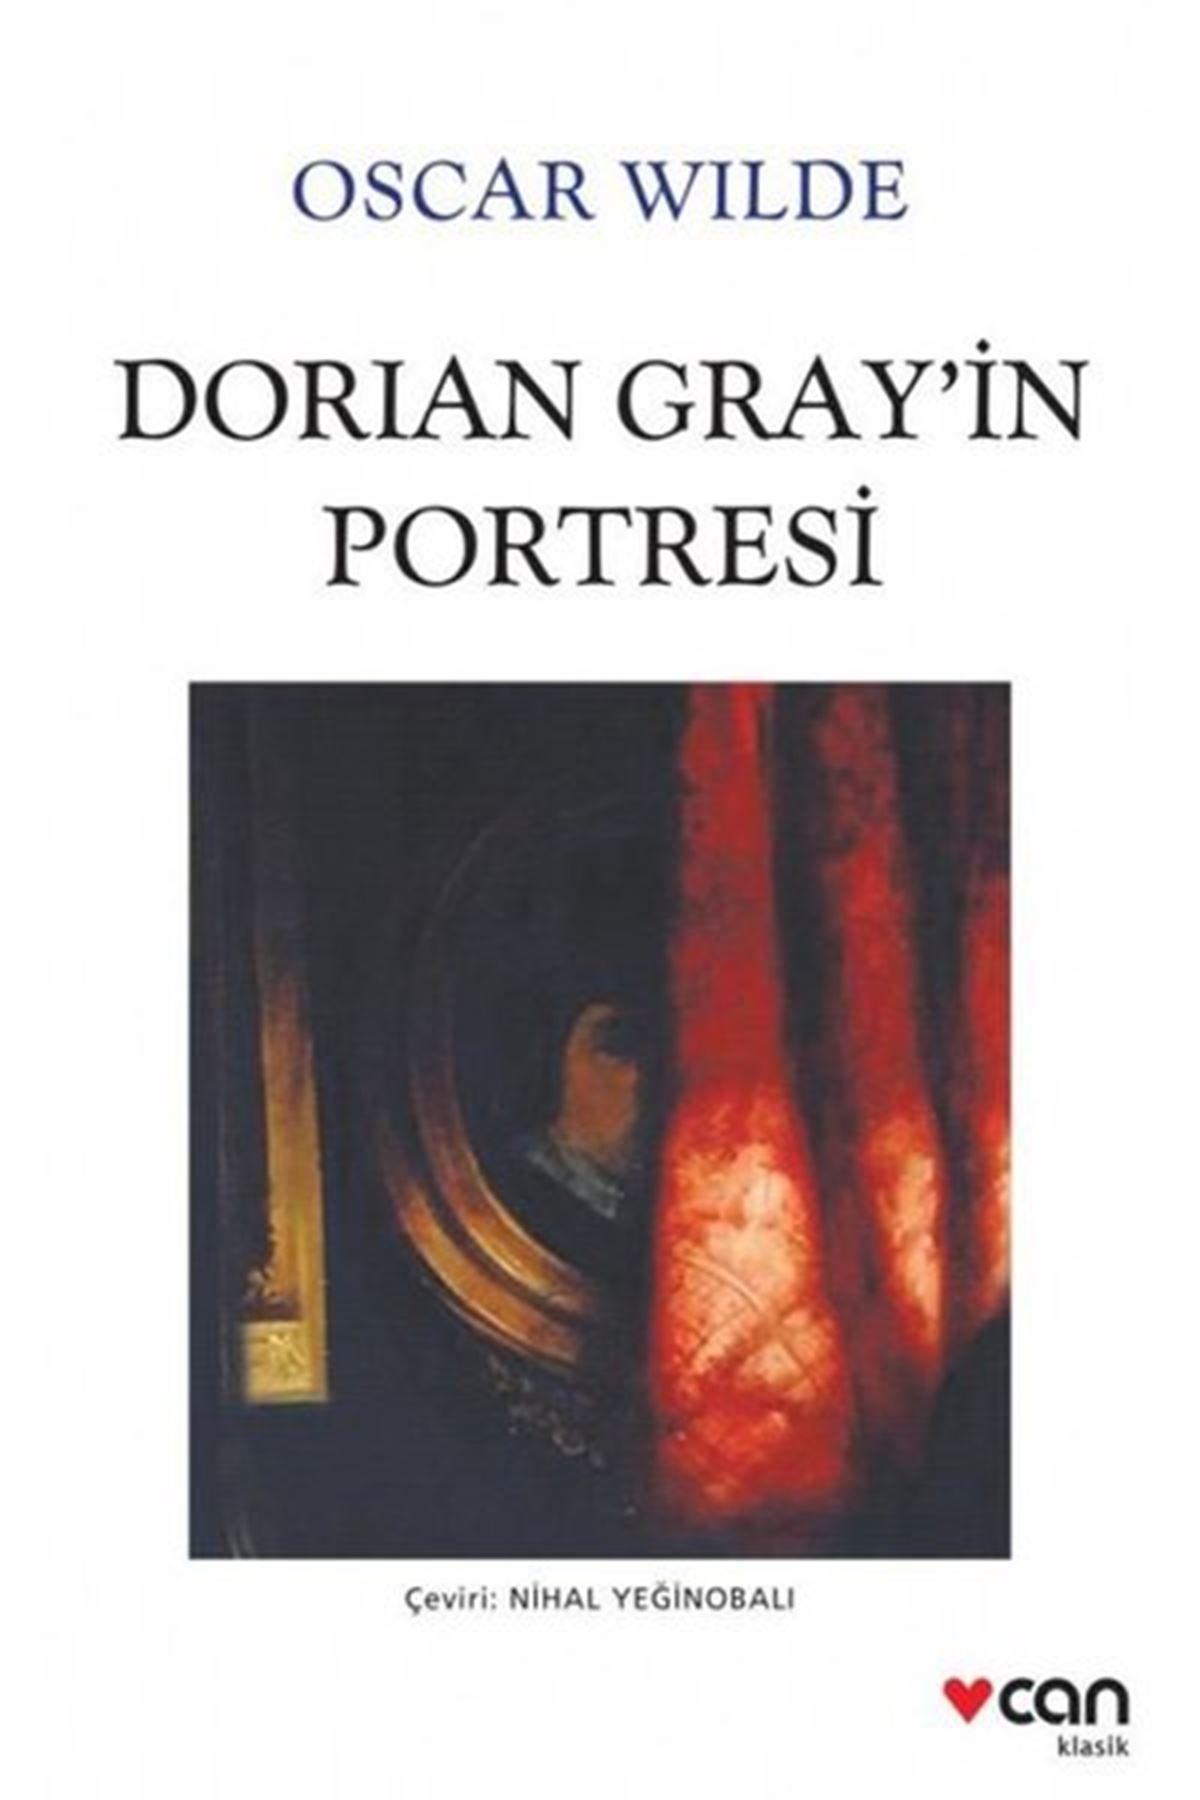 OSCAR WİLDE - DORİAN GRAY'İN PORTRESİ